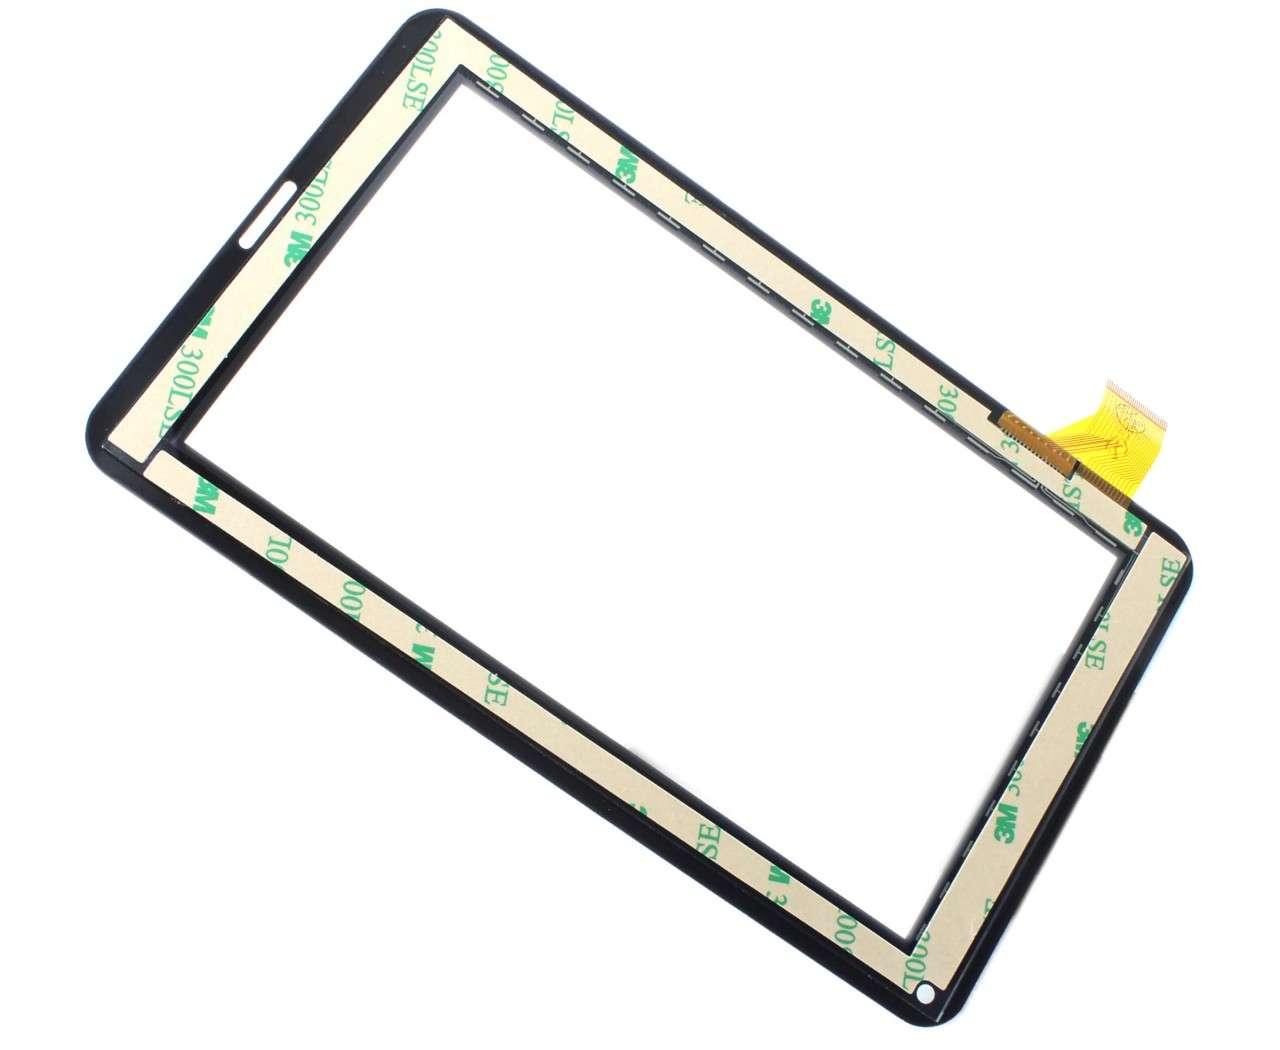 Touchscreen Digitizer Myria Extreme Power DBX KK723 Geam Sticla Tableta imagine powerlaptop.ro 2021